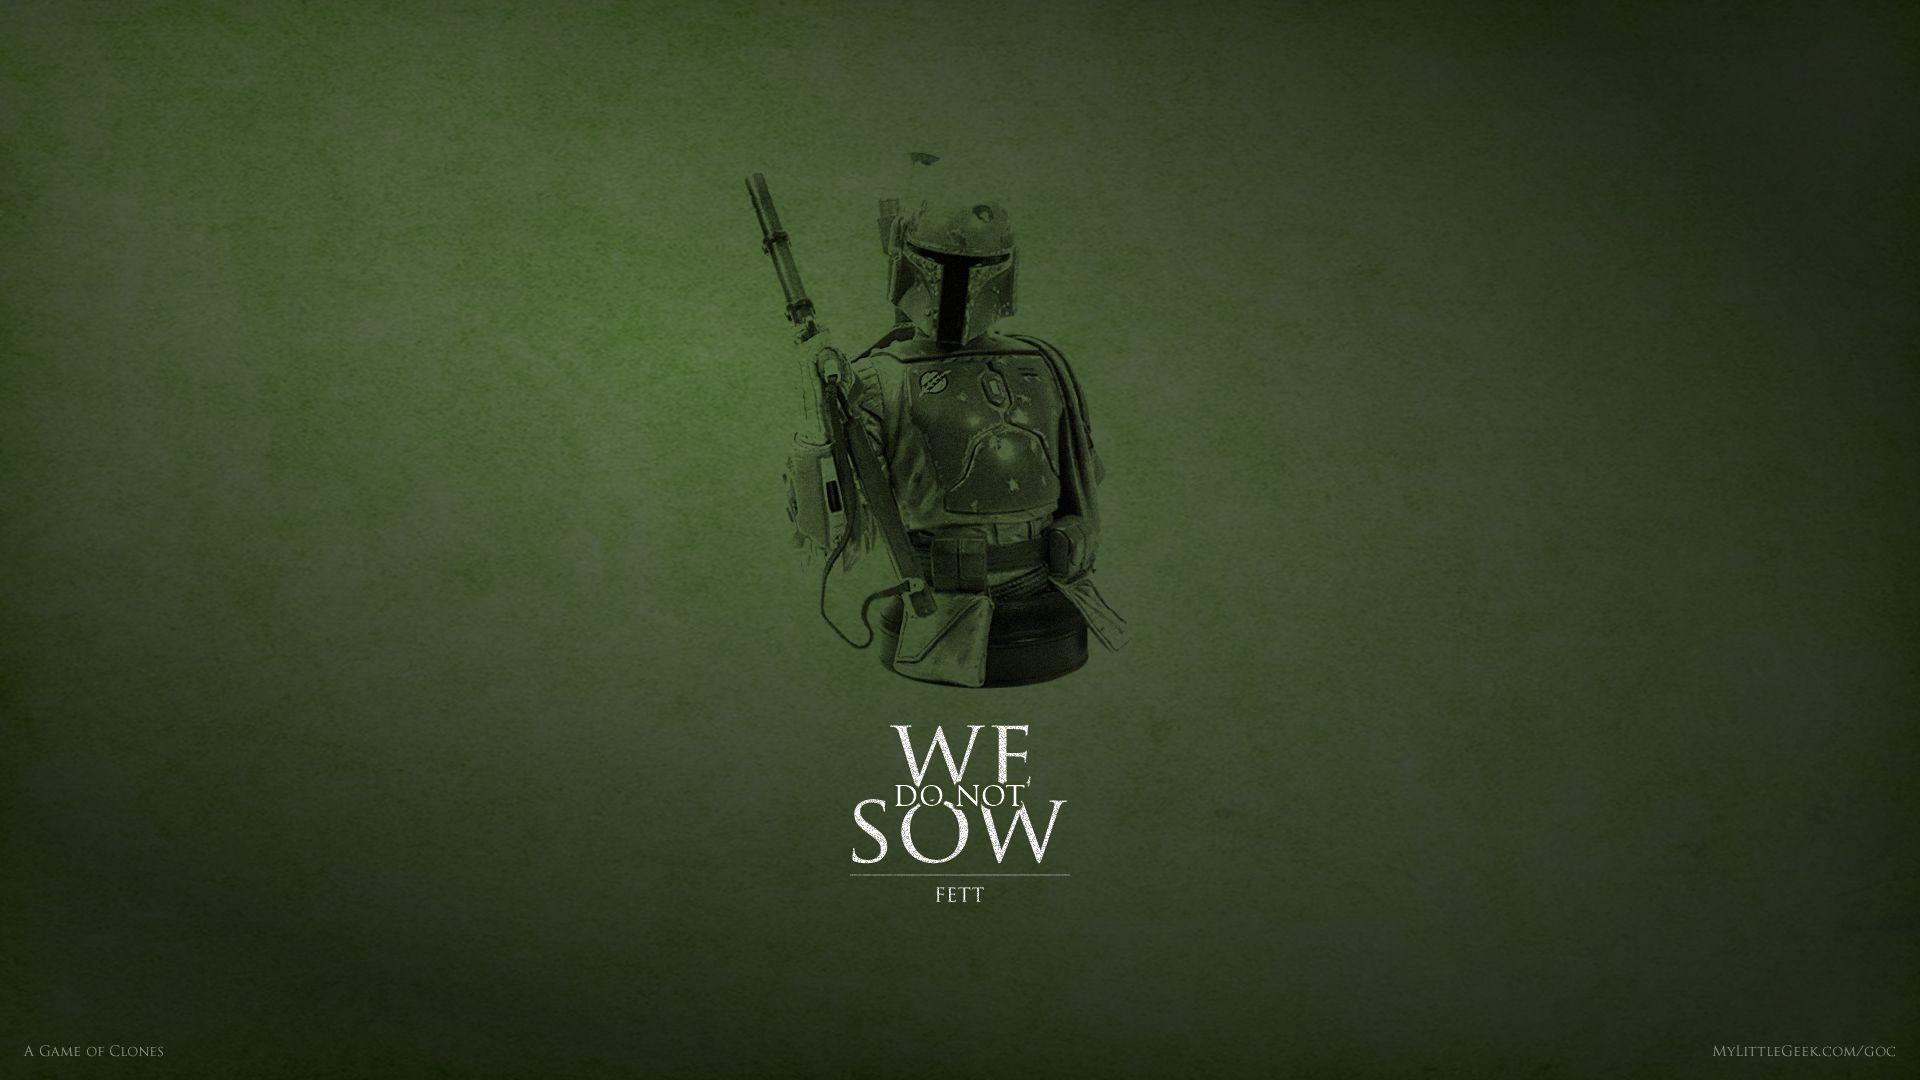 Wallpaper : Star Wars, green, graphic design, Boba Fett